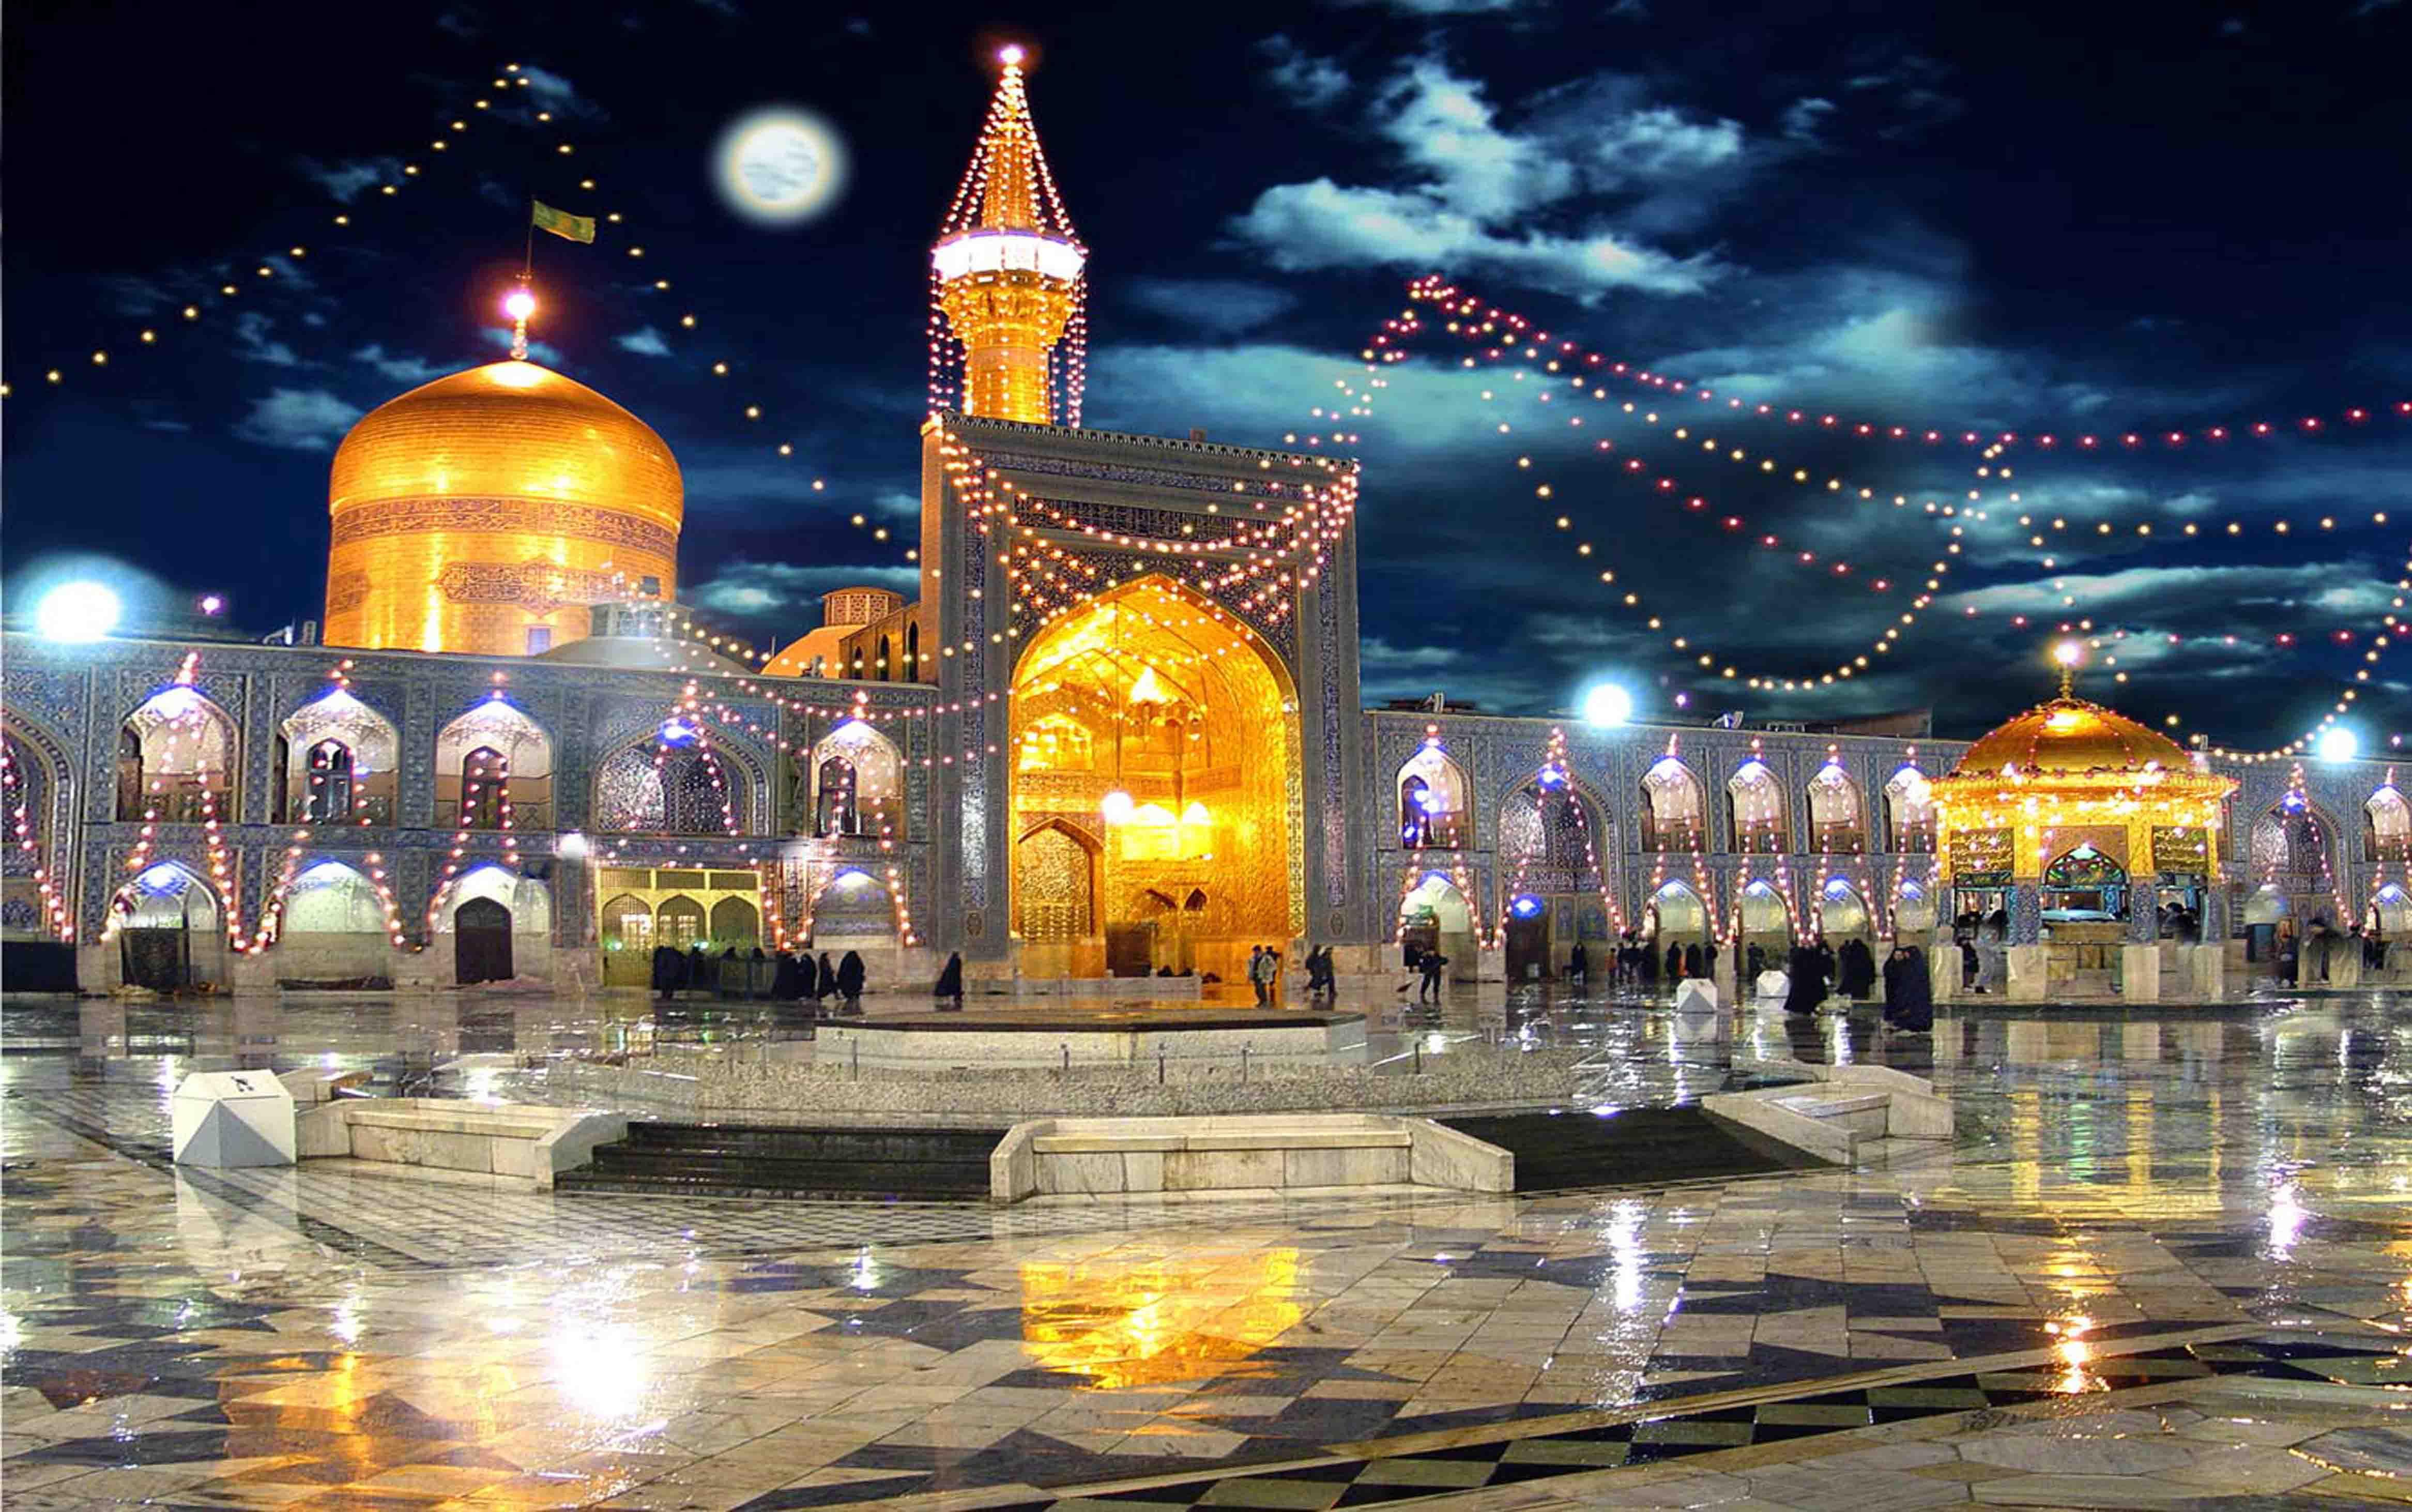 Iran_Mashhad_Imam_Riza_Shrine_8th_Shiite_Holy_Shrine_Night_Pilgrimage